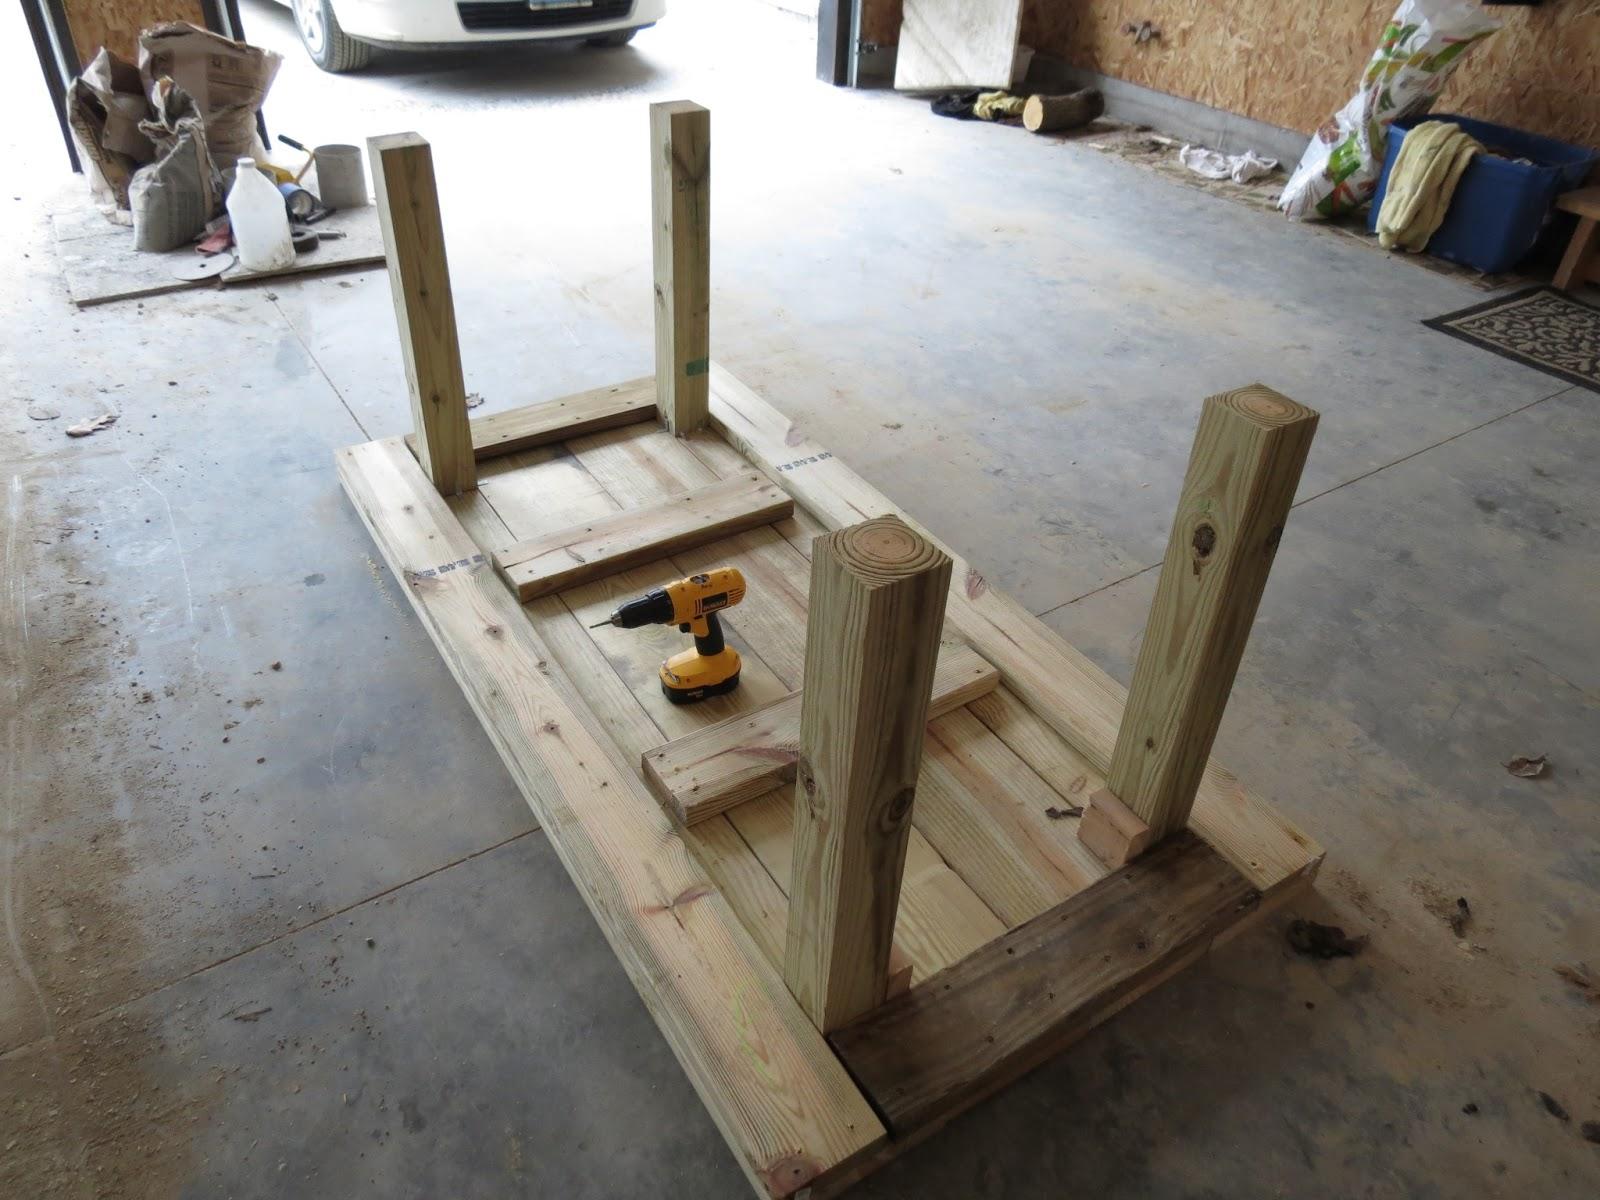 Let's Just Build a House!: DIY Simple Patio Table Details